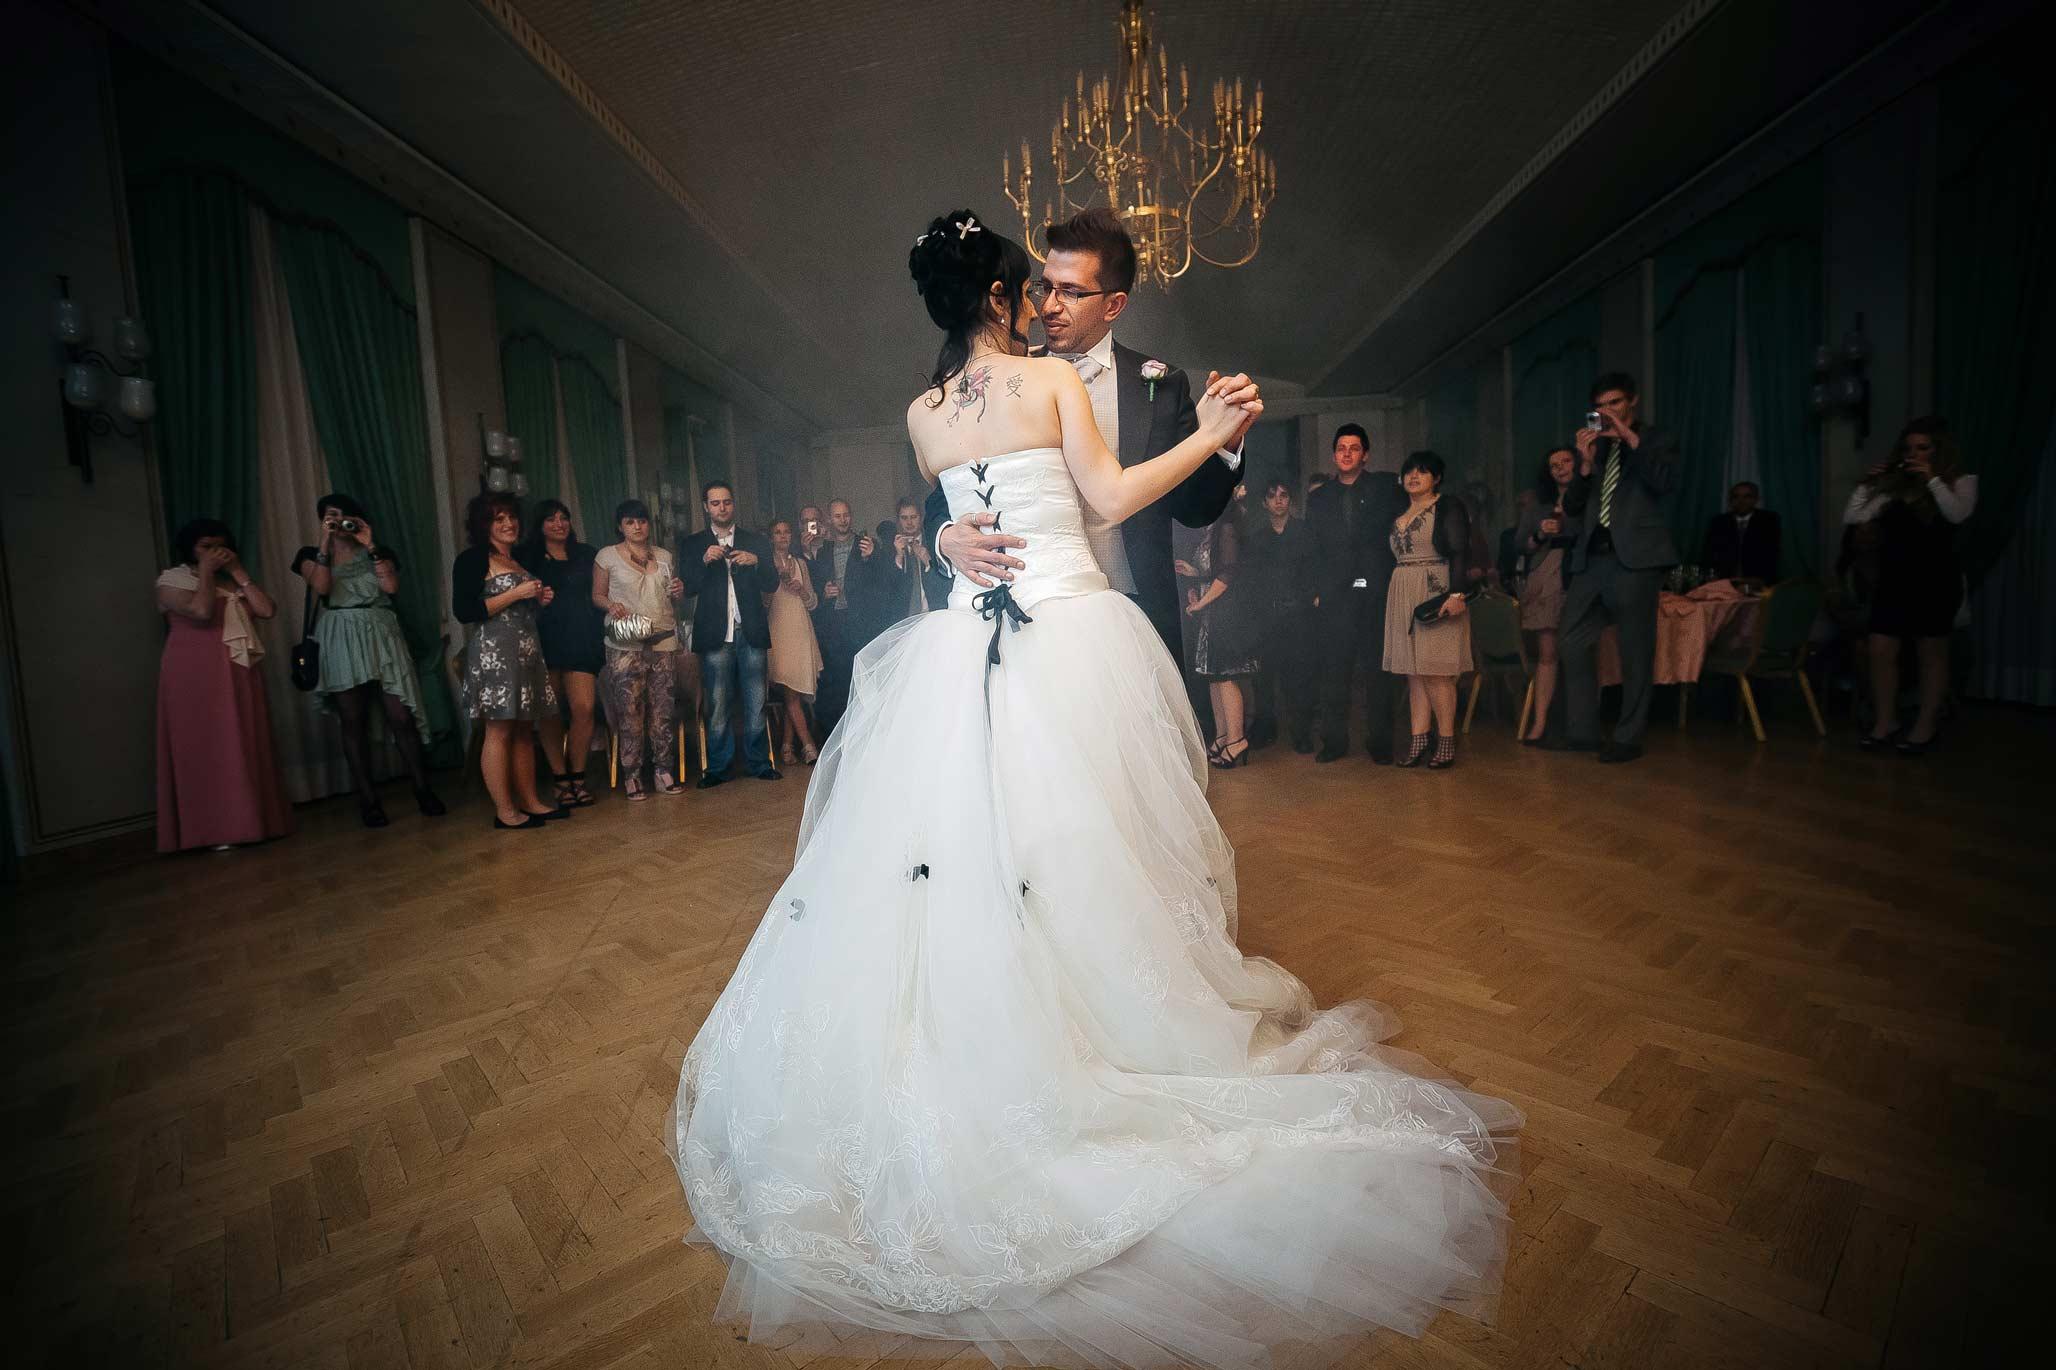 Matrimonio-Fotografo-Reportage-Festa